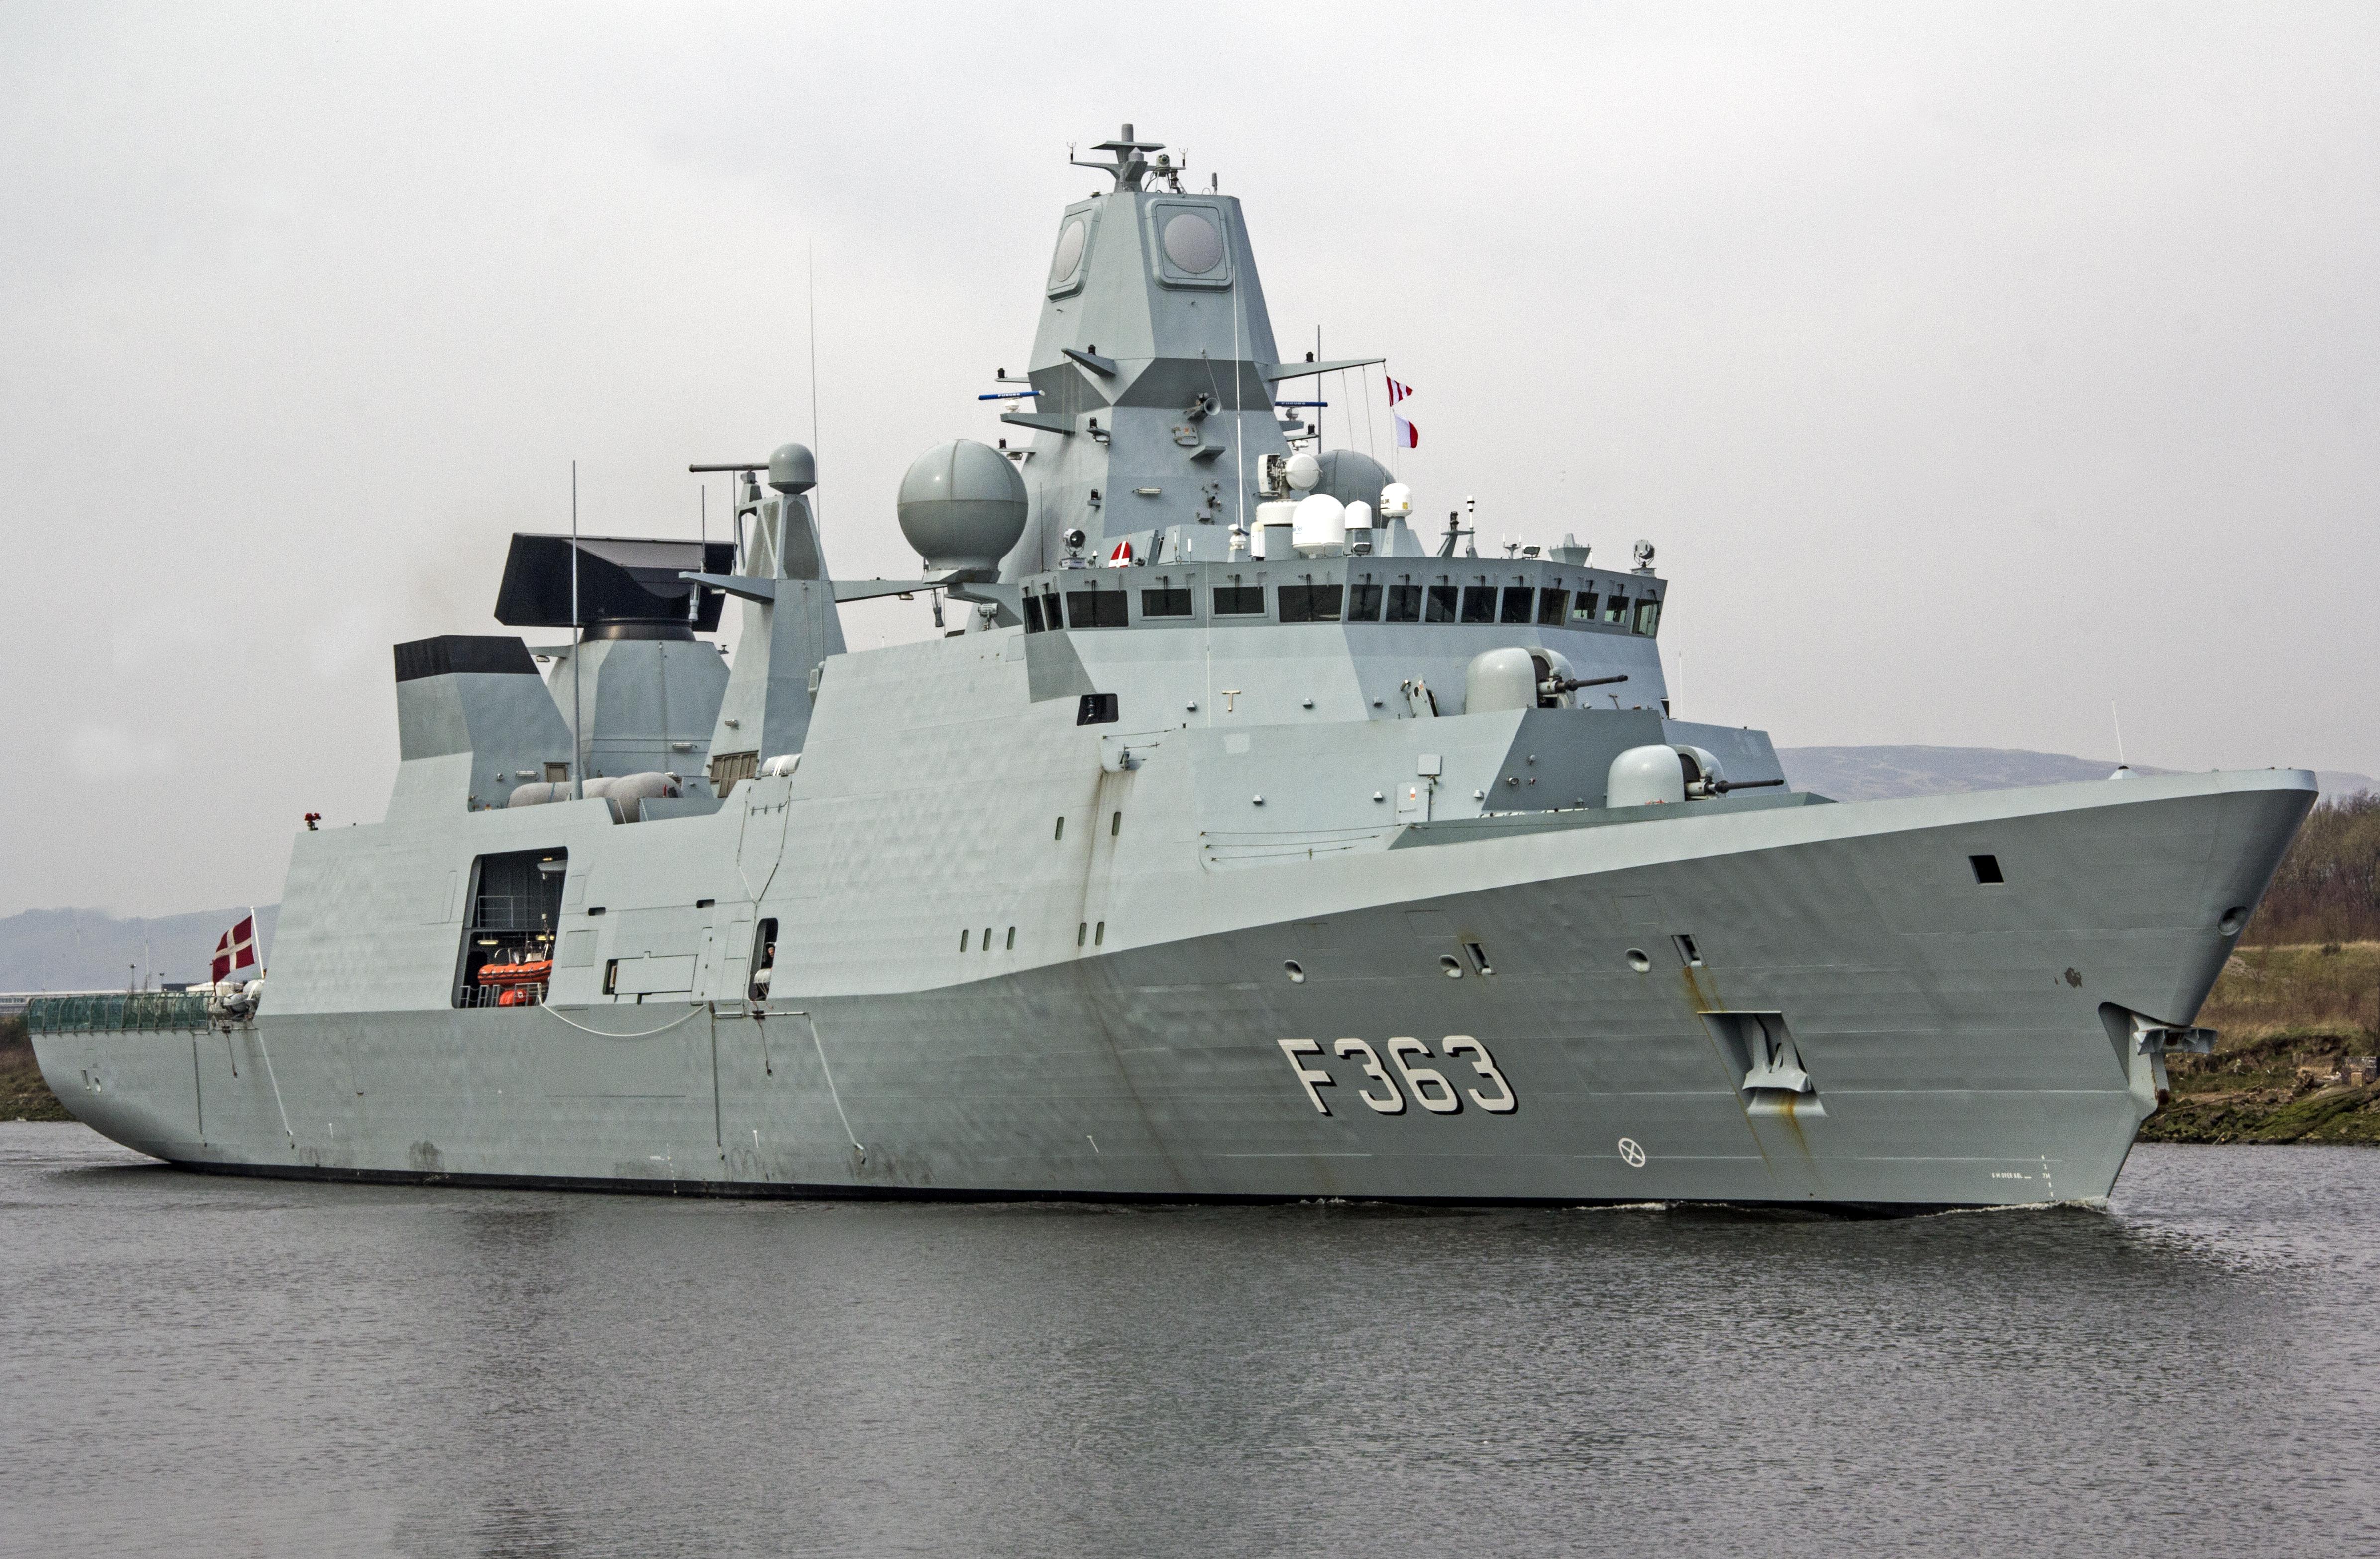 Danish Navy - Marine Danoise - Page 2 16483089173_fd3e6c0375_o